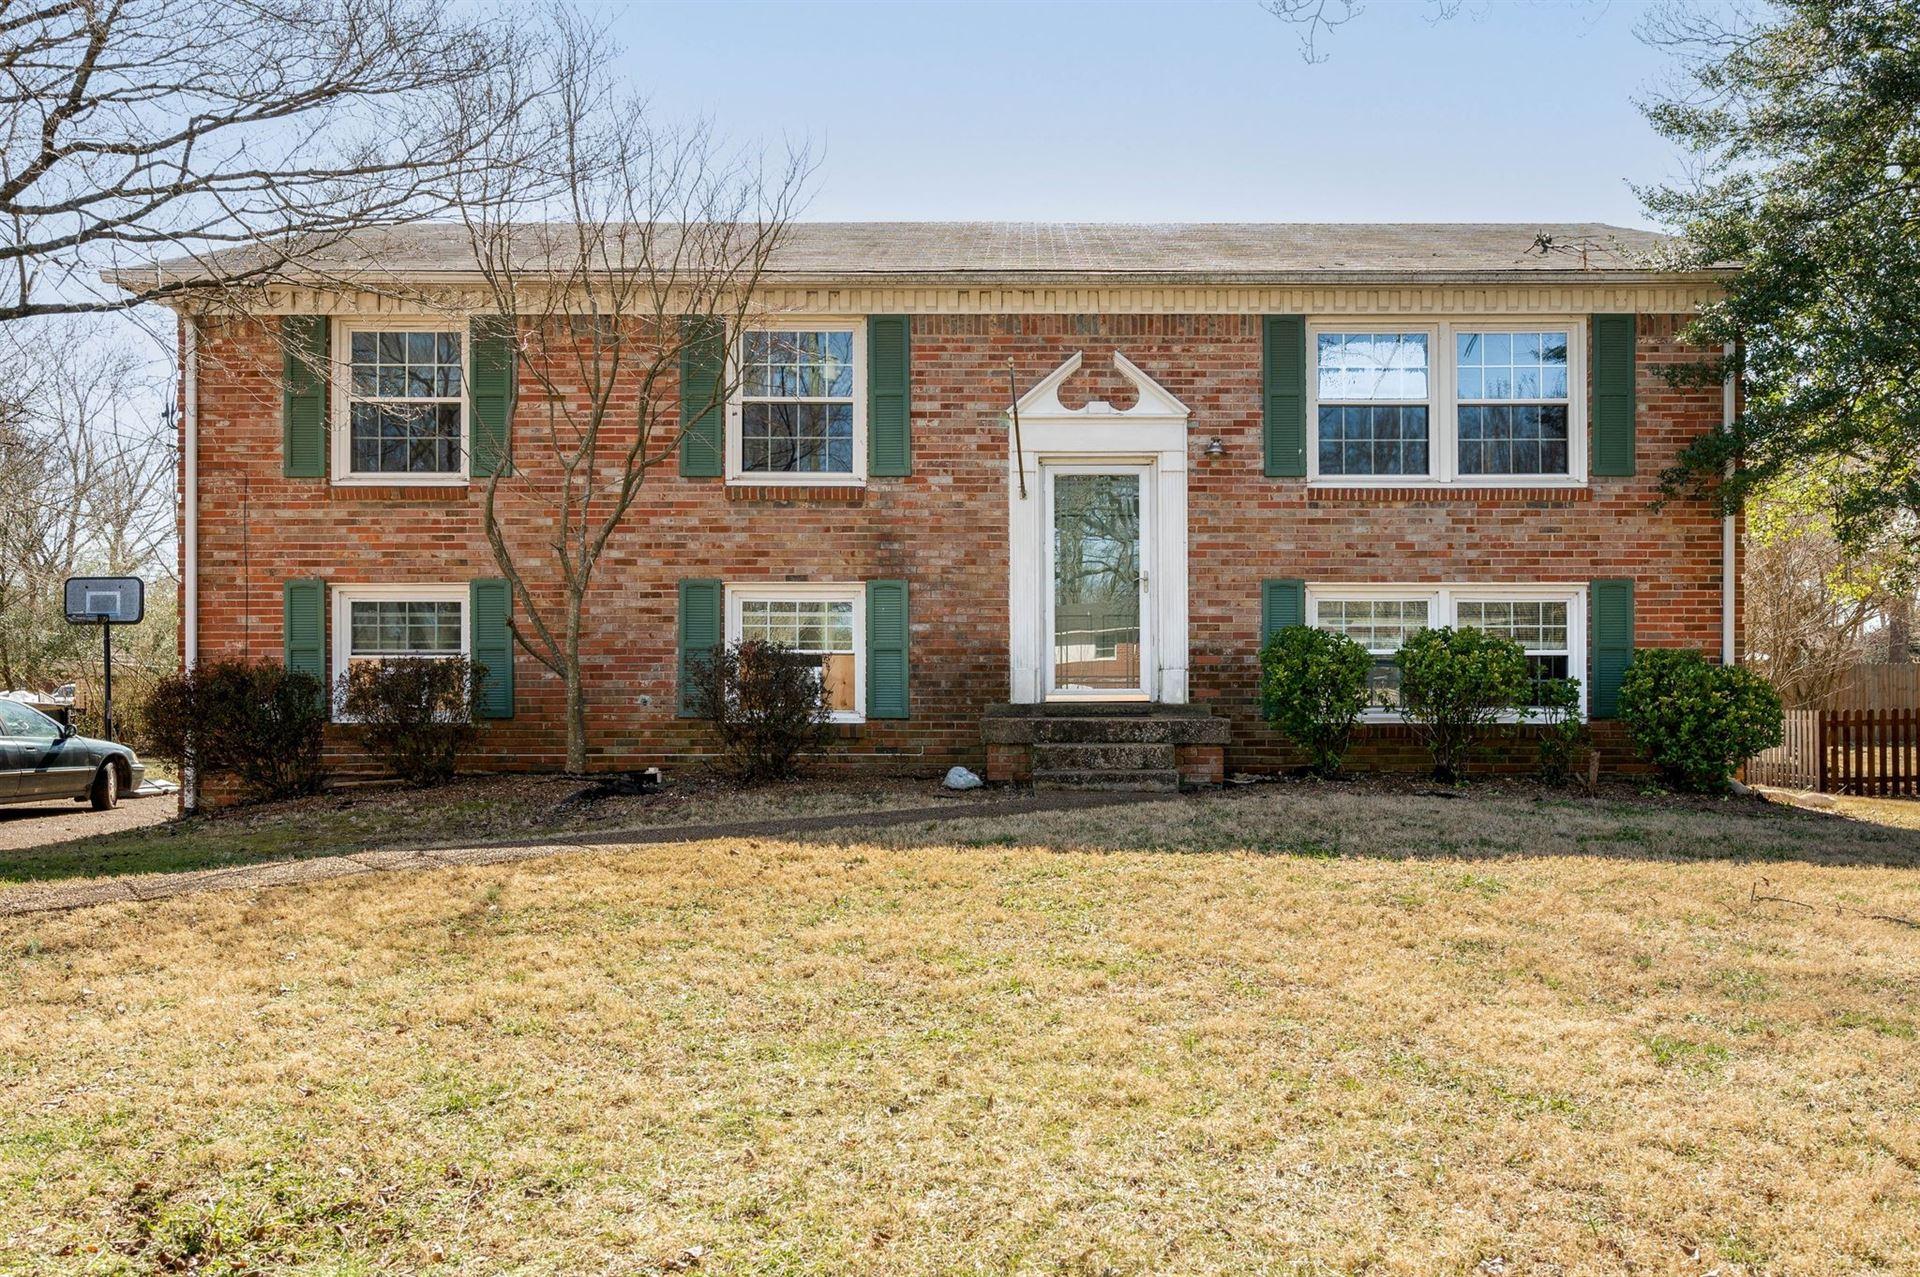 Photo of 1522 Foxdale Dr, Murfreesboro, TN 37130 (MLS # 2230013)